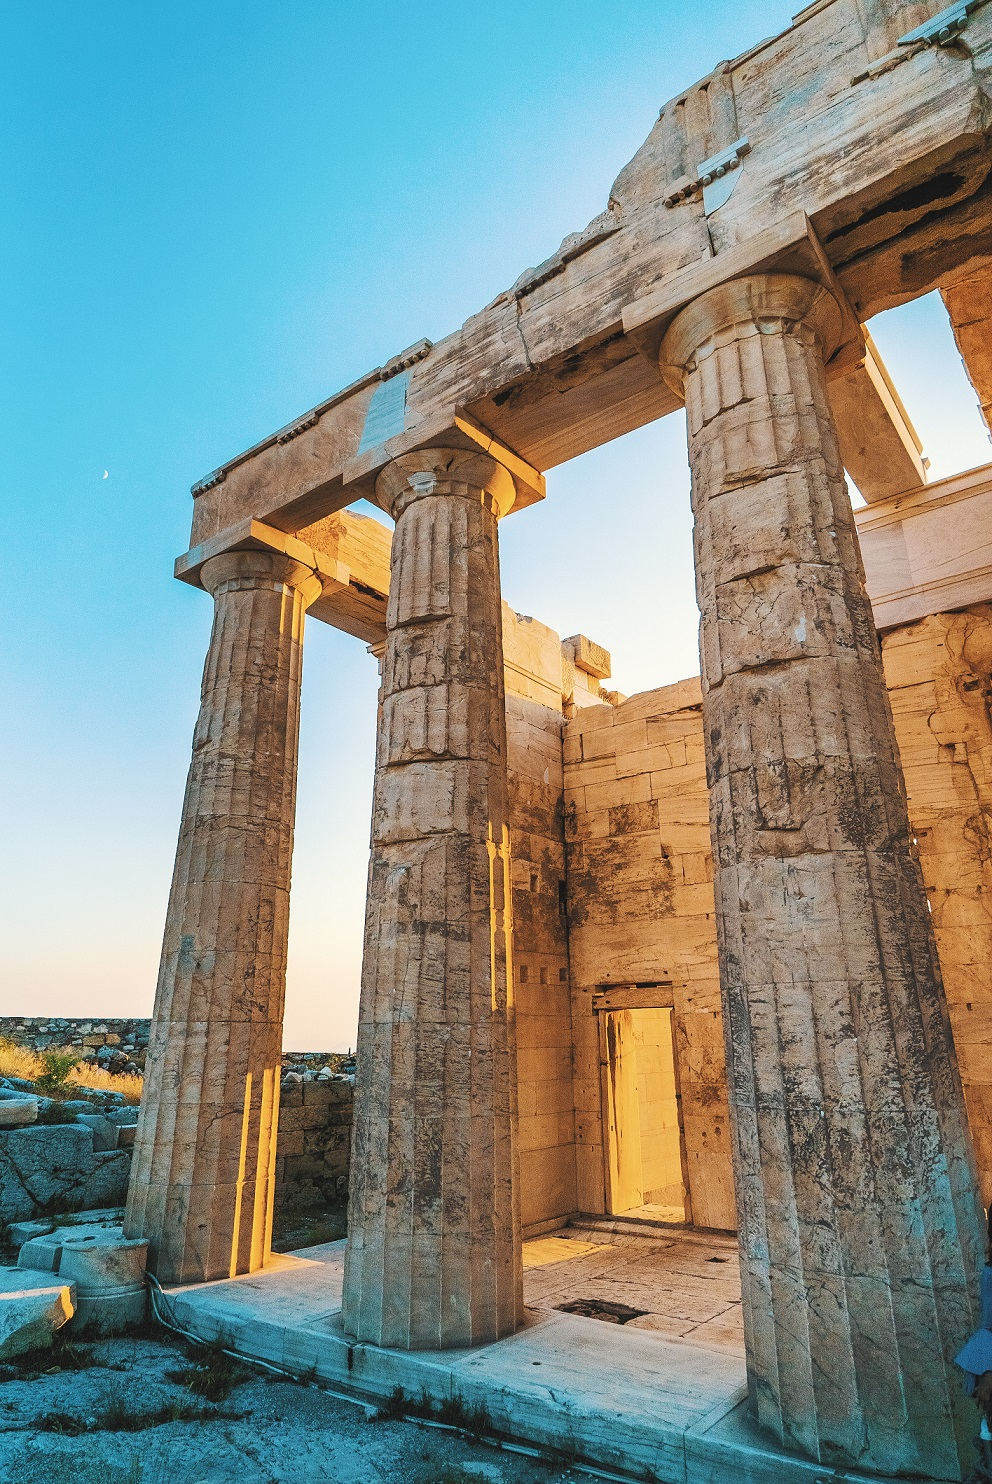 Akropolis i Aten, en historisk ruin